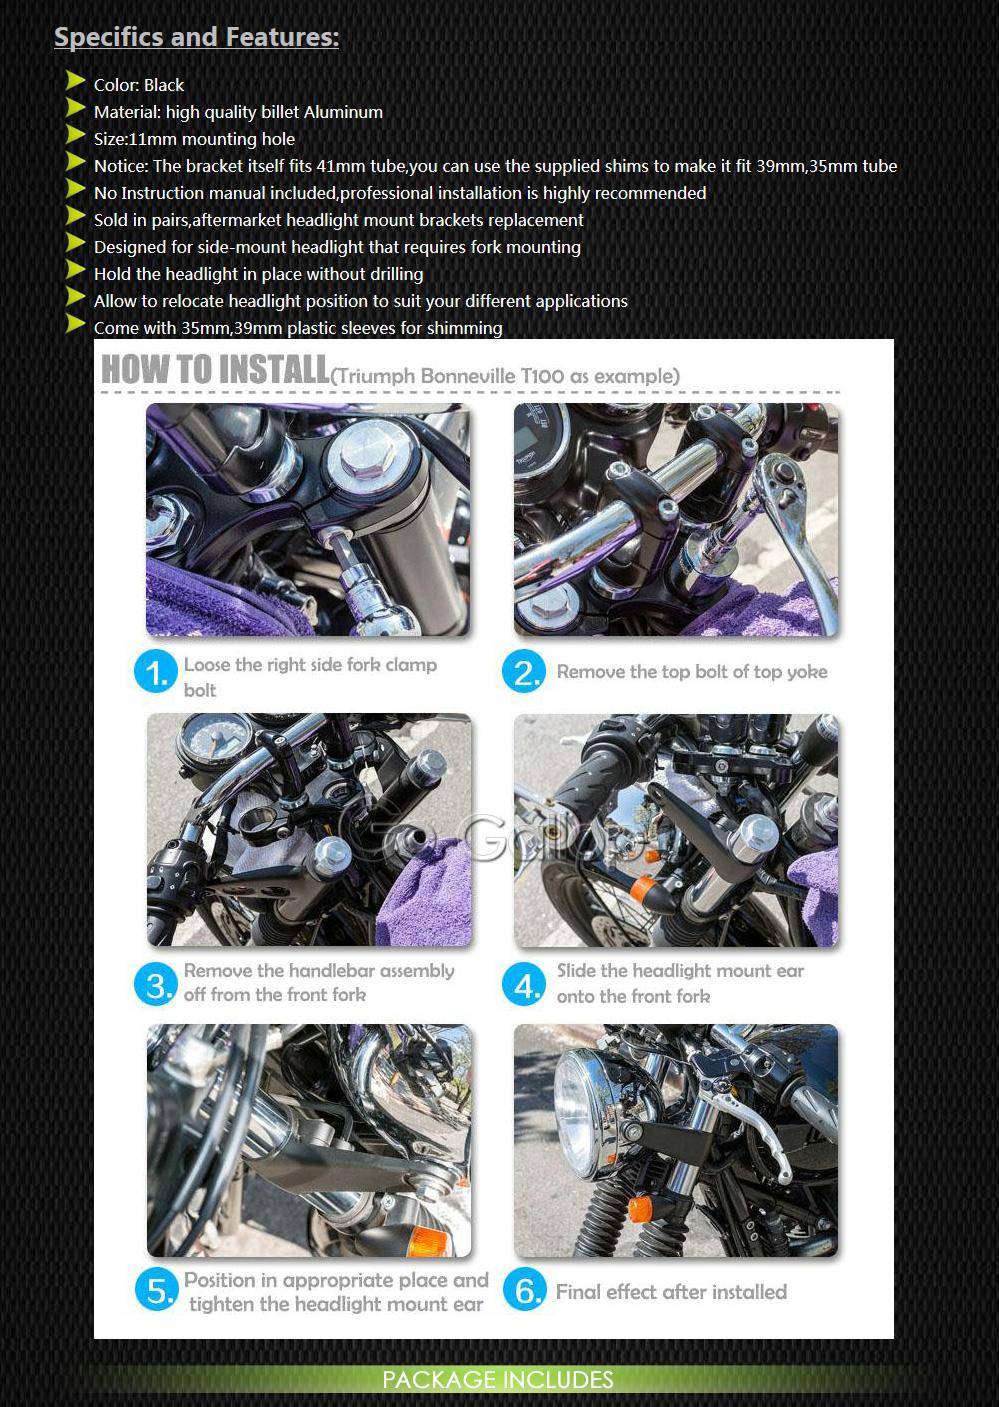 Frenshion 38-51mm L/ámpara de faros de la motocicleta Soporte de horquilla de montaje Negro Universal Headlight Lamp Mount Fork Bracket para Chopper Bobber Street Bike Cafe Racer Harley Davidson